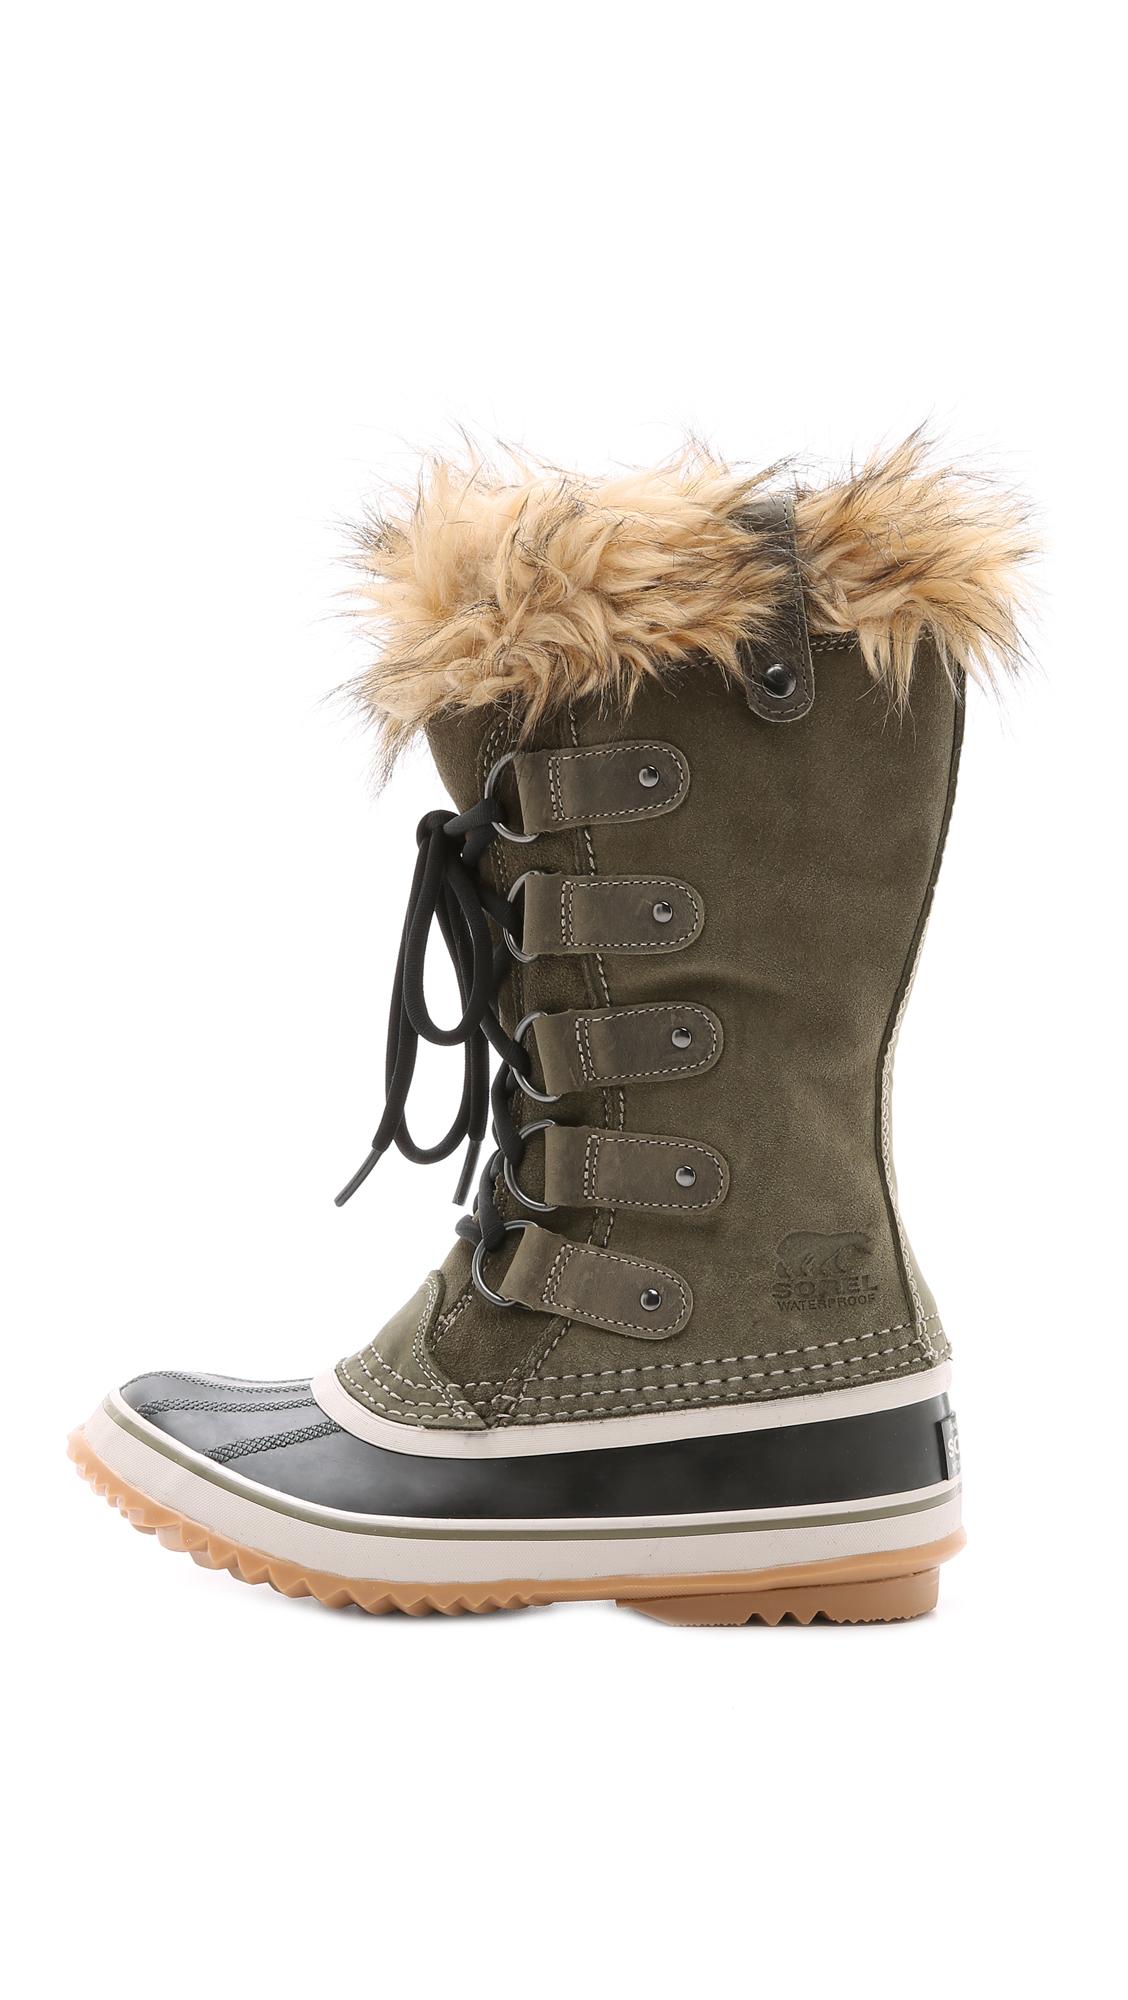 sorel joan of arctic boots black in green nori lyst. Black Bedroom Furniture Sets. Home Design Ideas